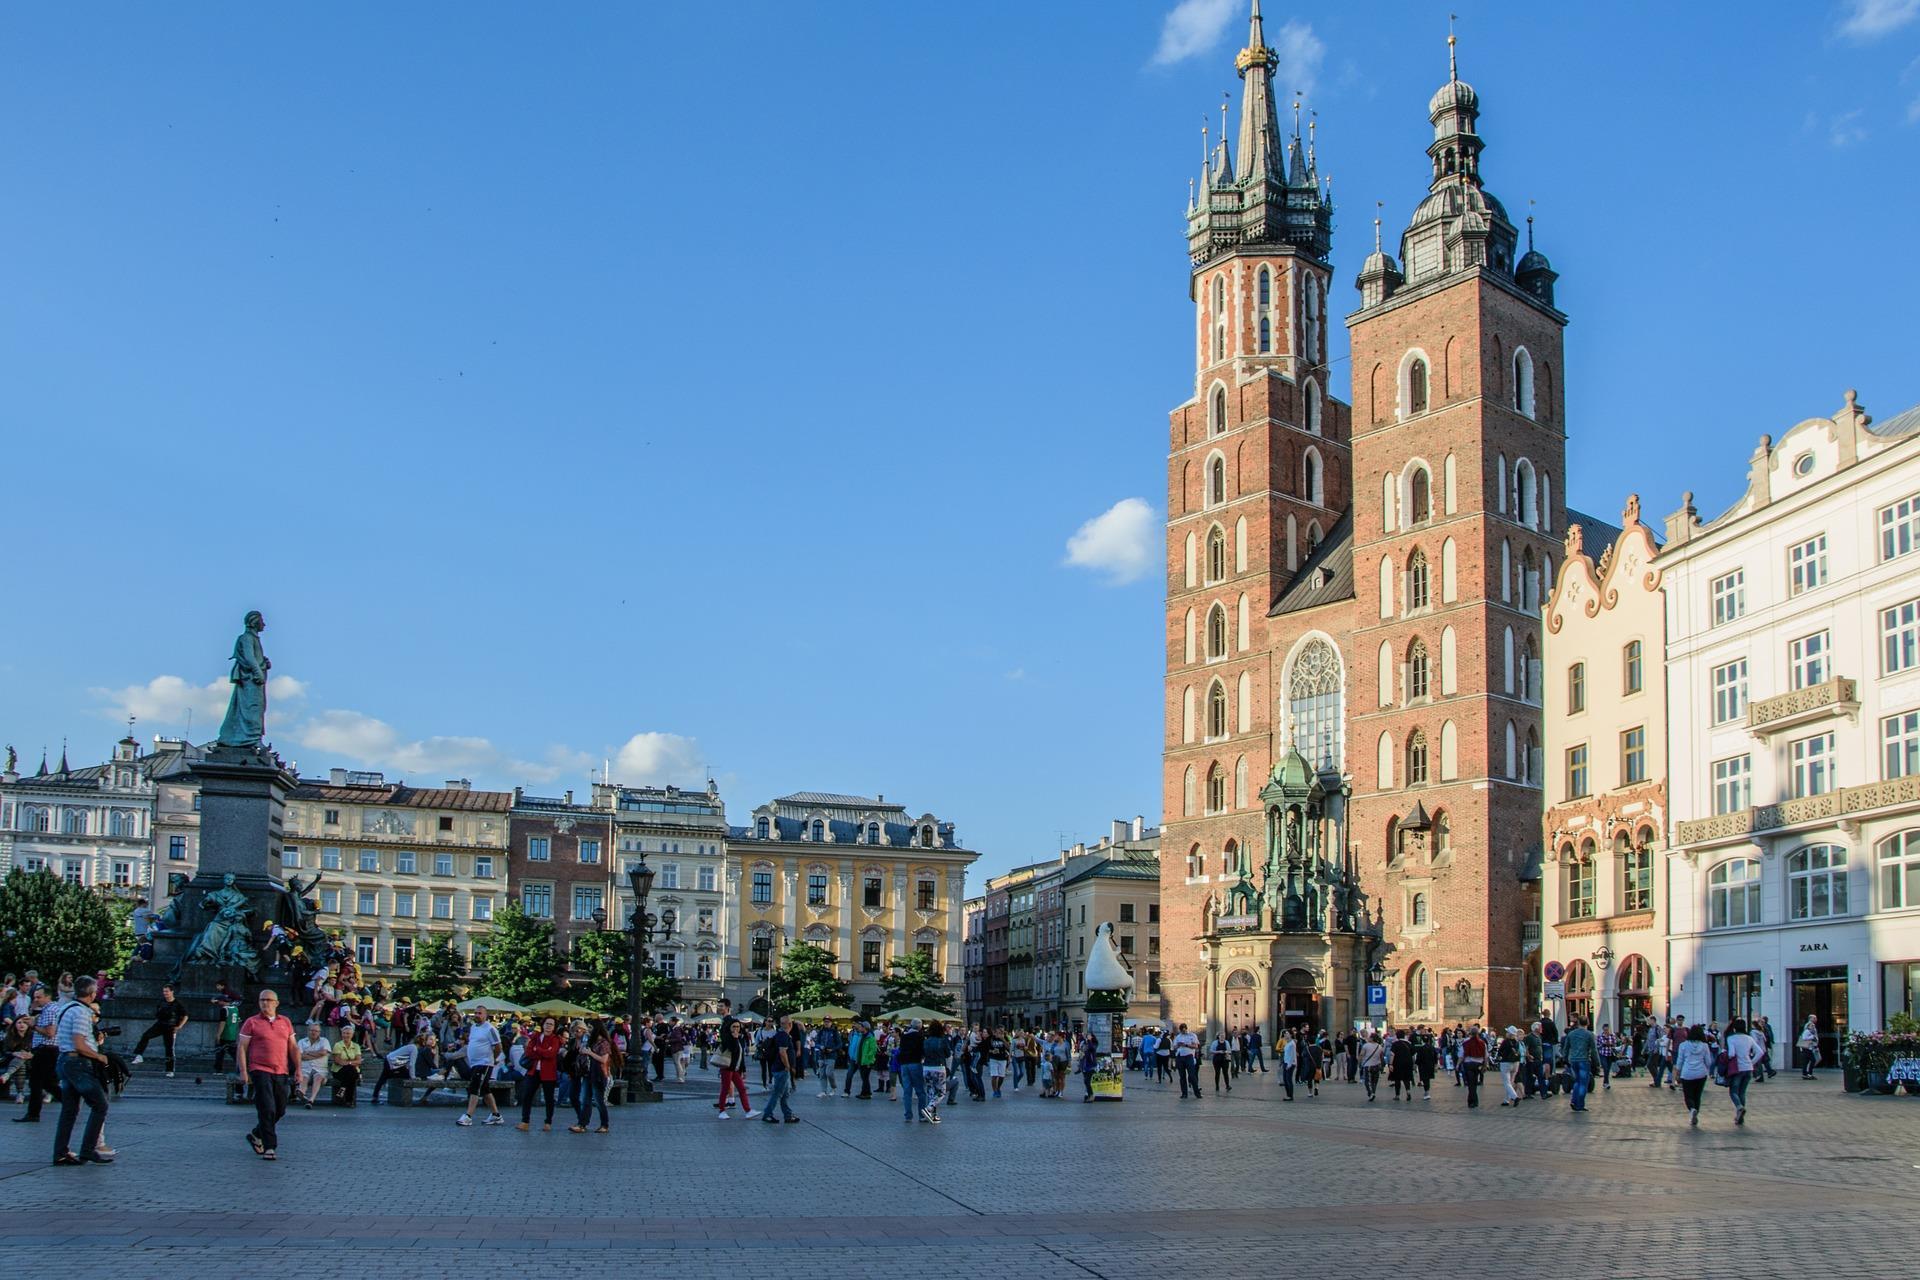 krakow-1526667_1920 (Copy)